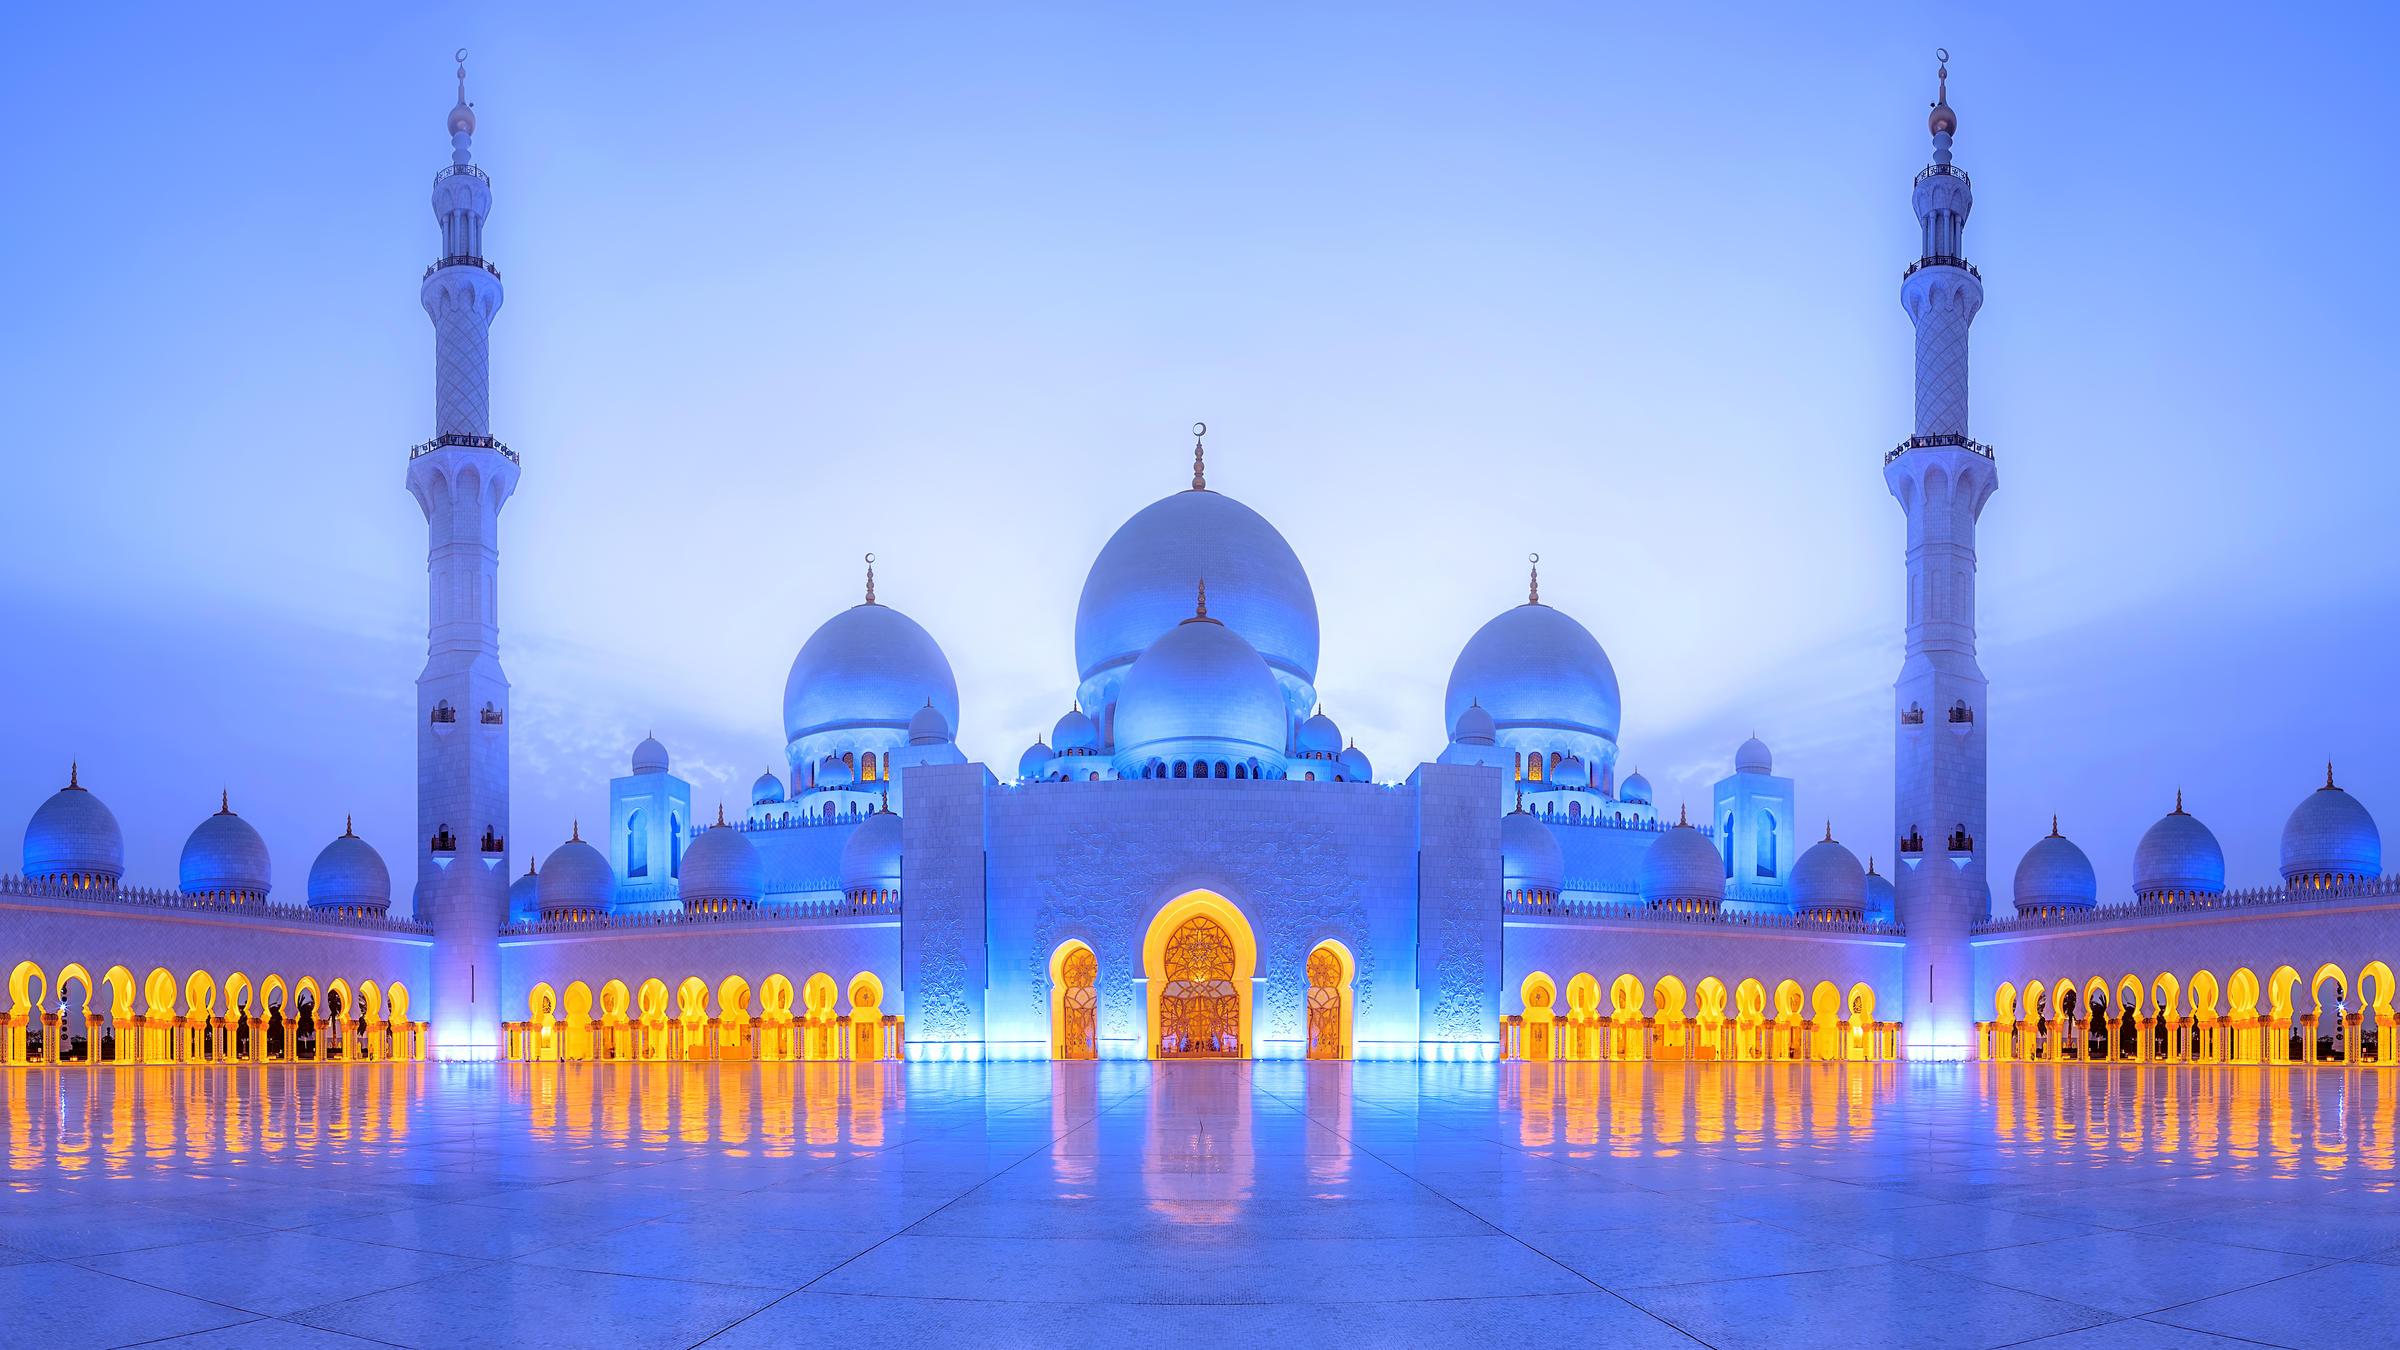 Белая мечеть дубай фото хилтон дубай аль мина